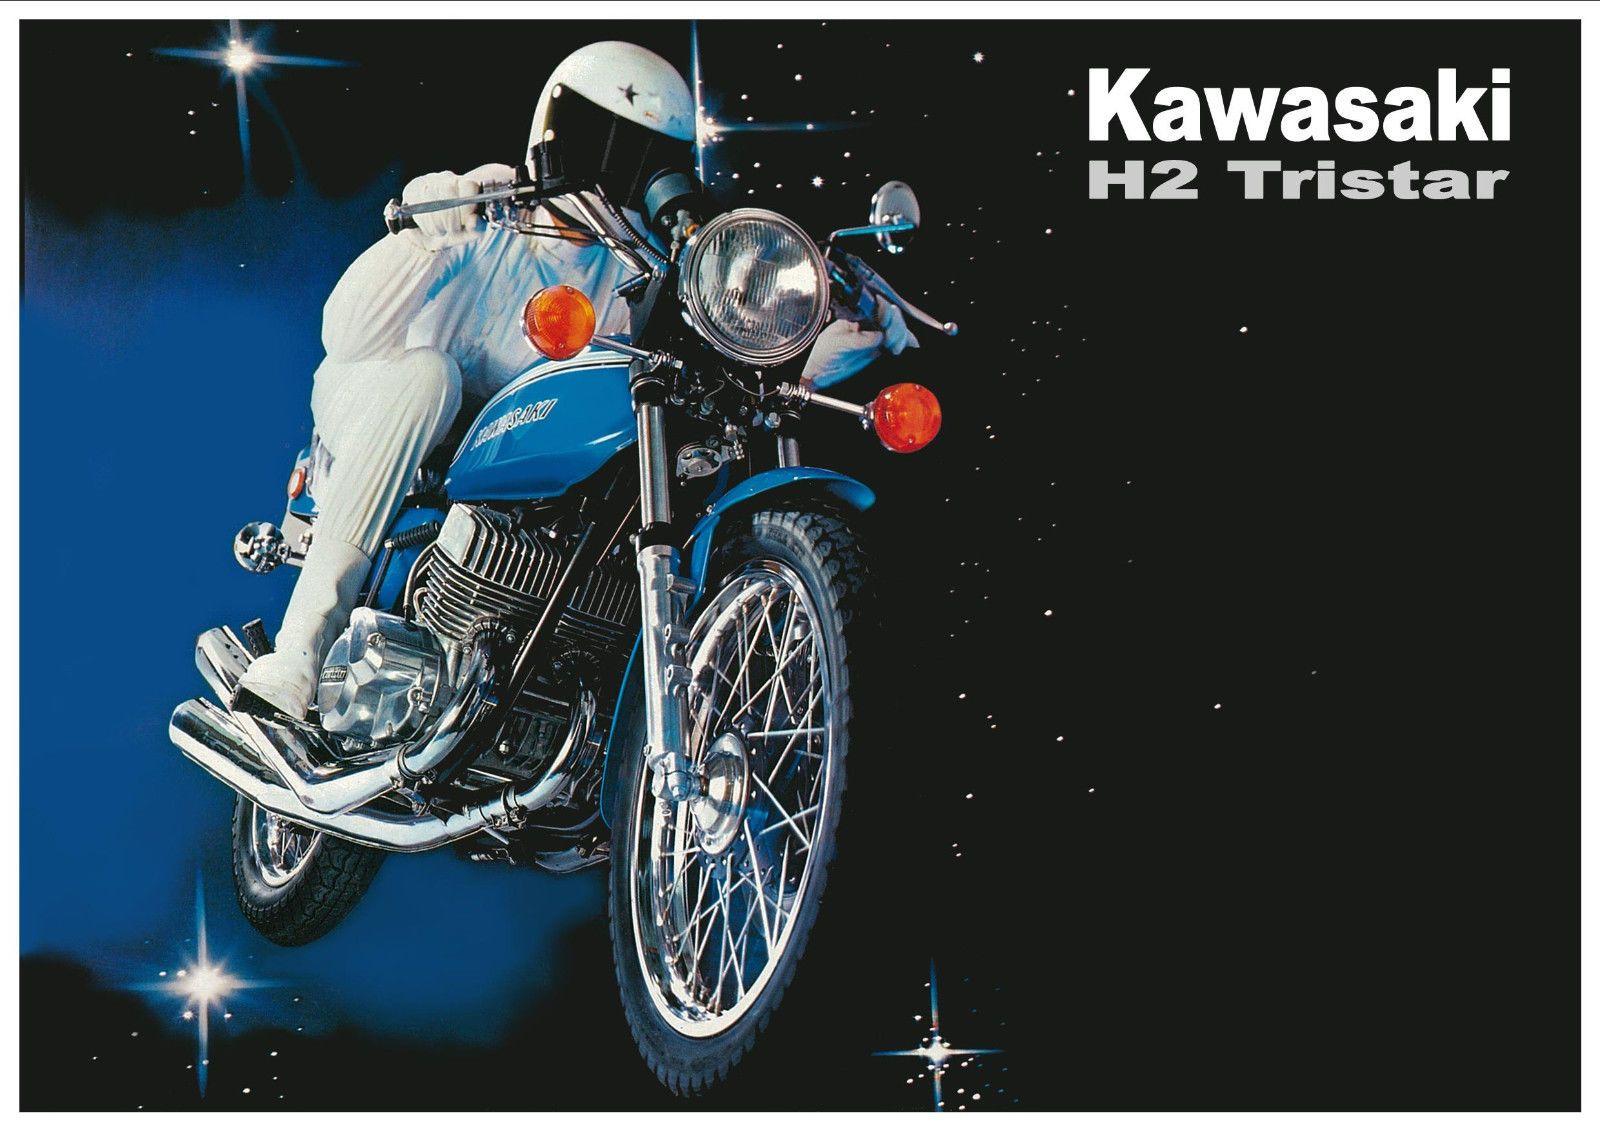 KAWASAKI Poster H2 Mach IV 750cc TriStar 1972 Suitable to